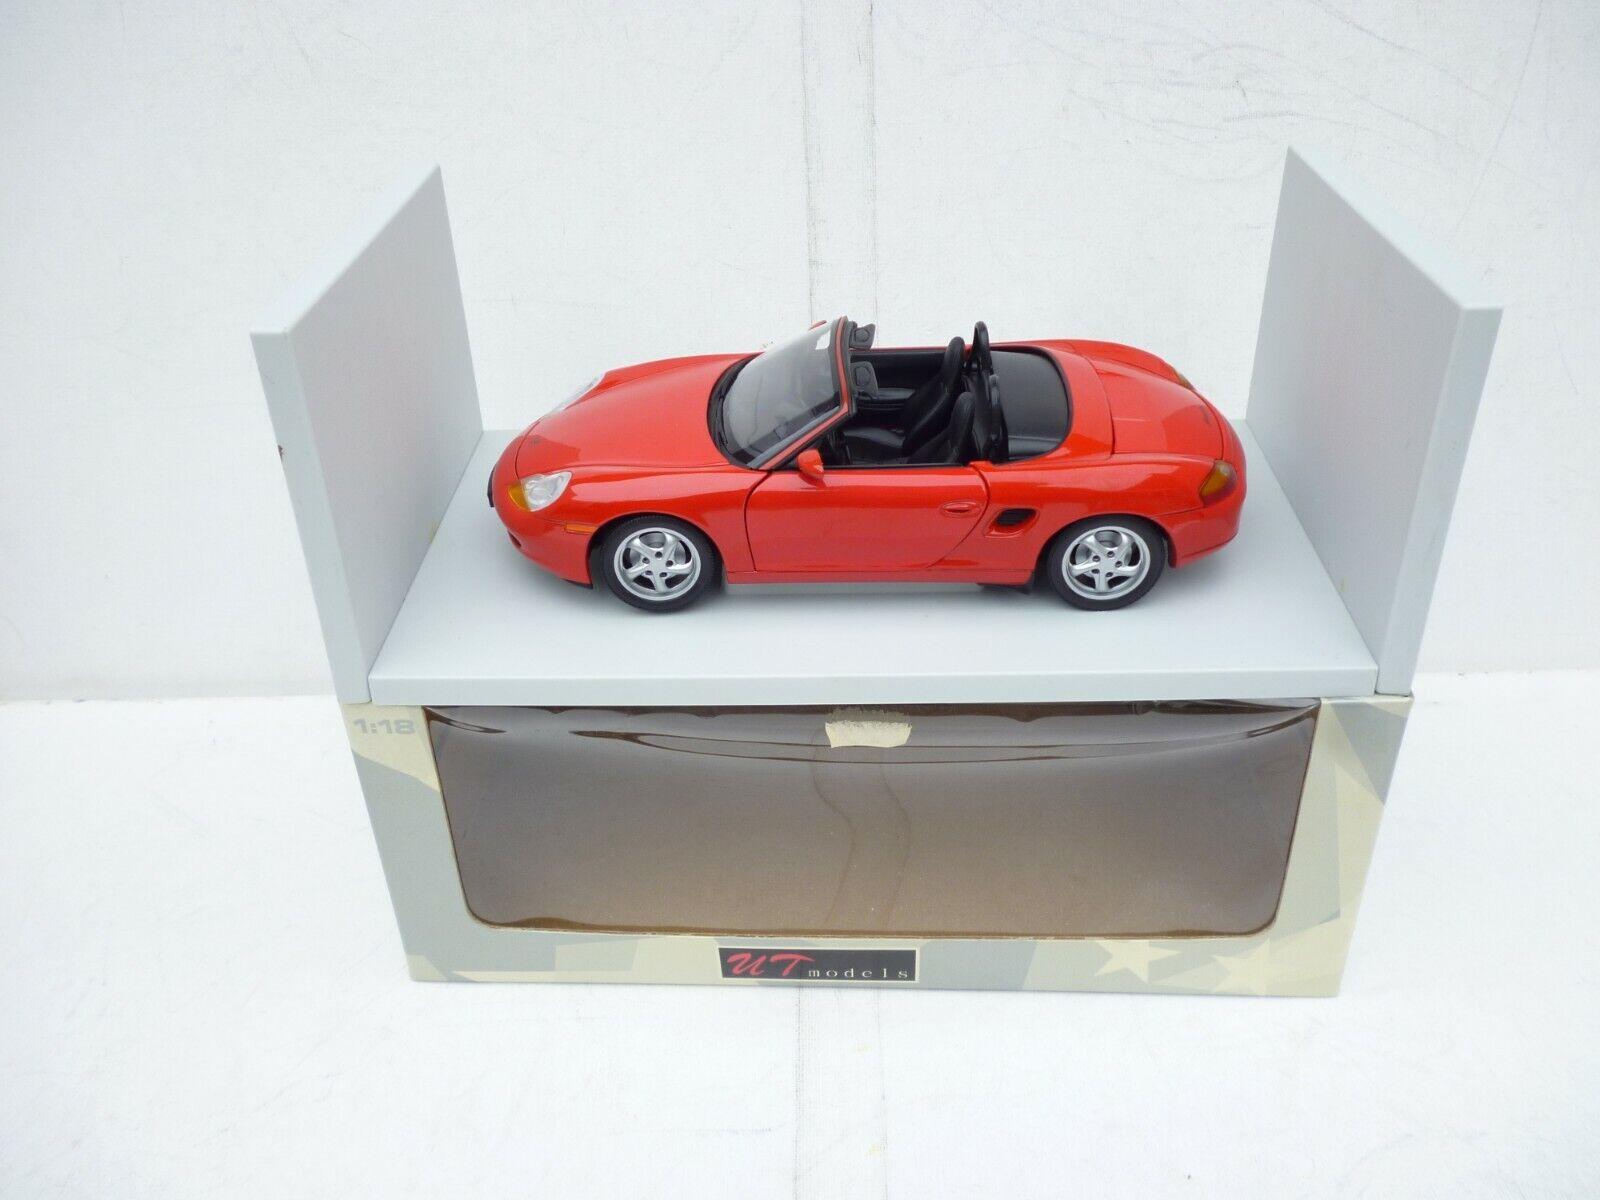 UT Models Modellauto 1 18 Porsche Boxter Congreenibele  In Racing Red M Boxed